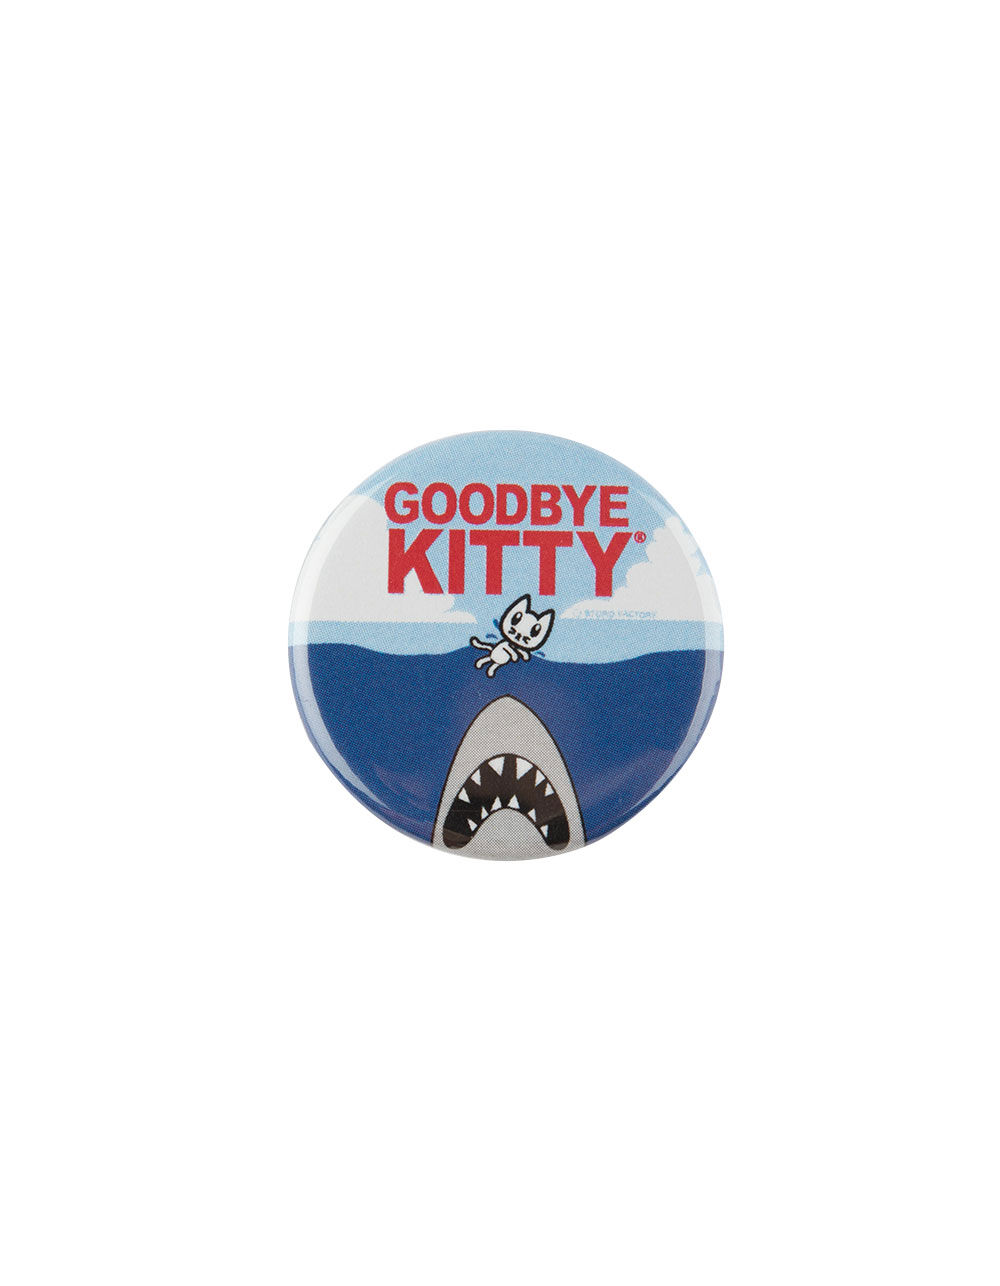 Image of GOODBYE KITTY PIN